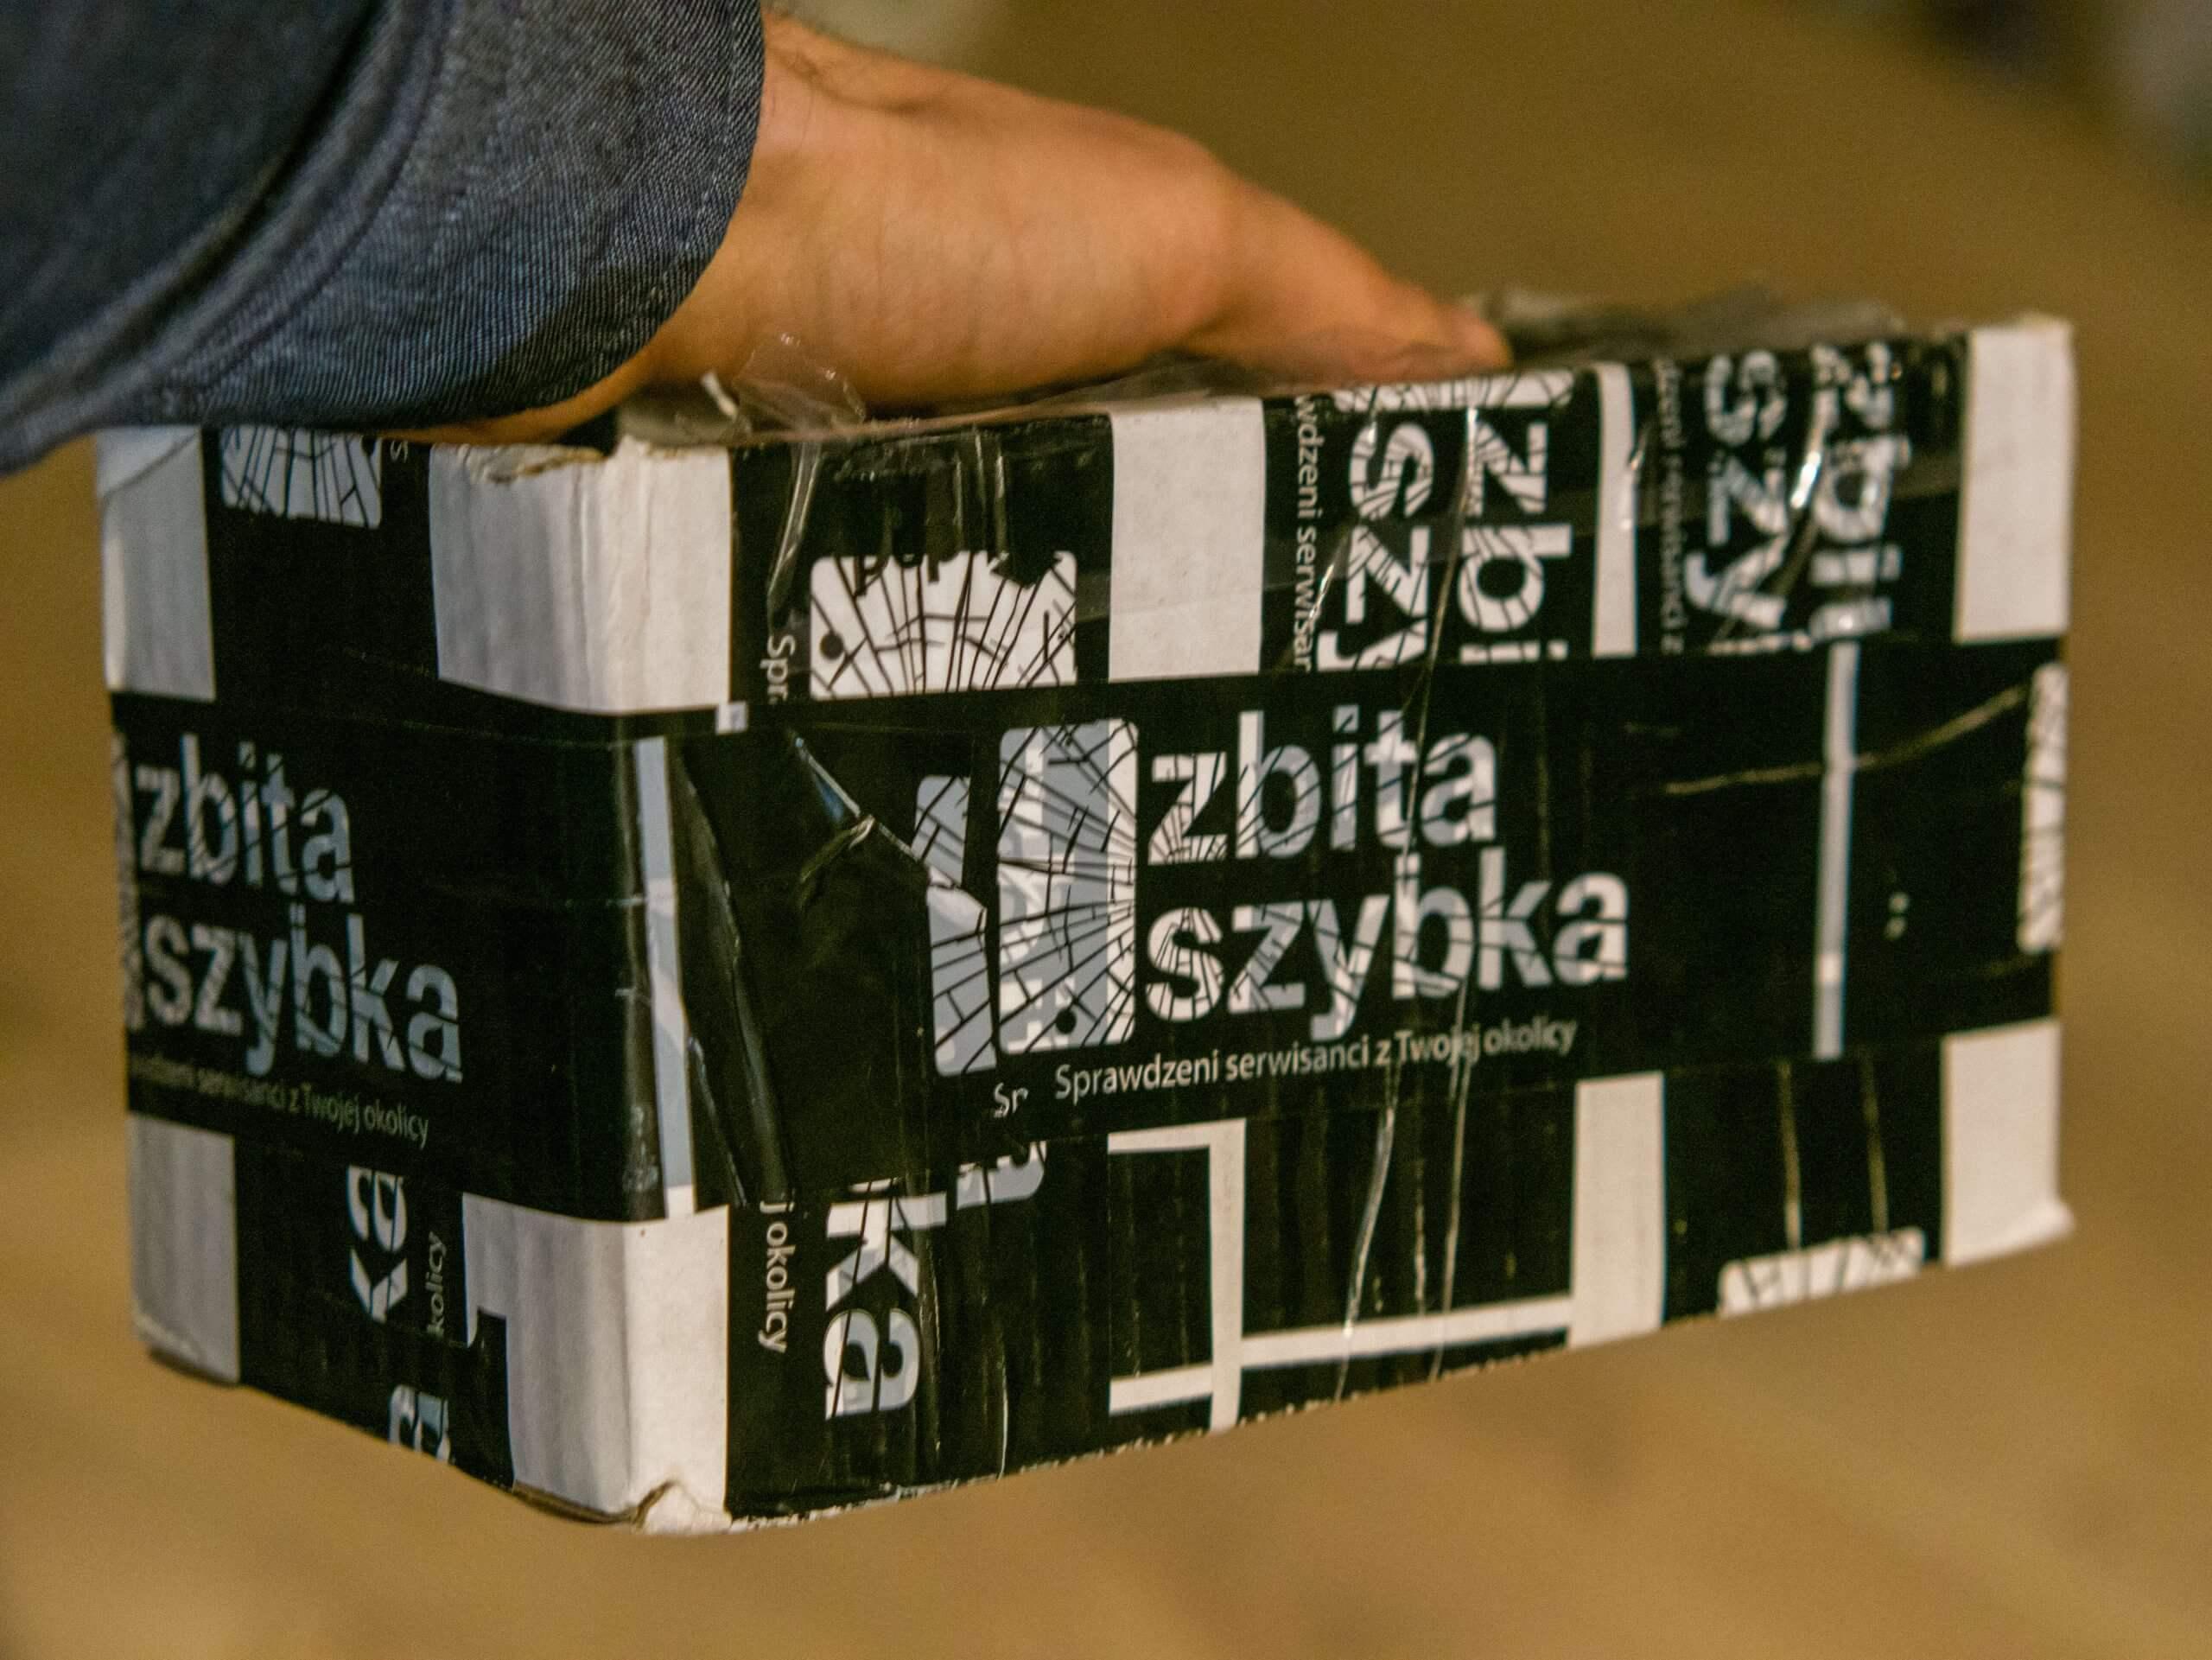 Zbitaszybka.pl iphone serwis-1